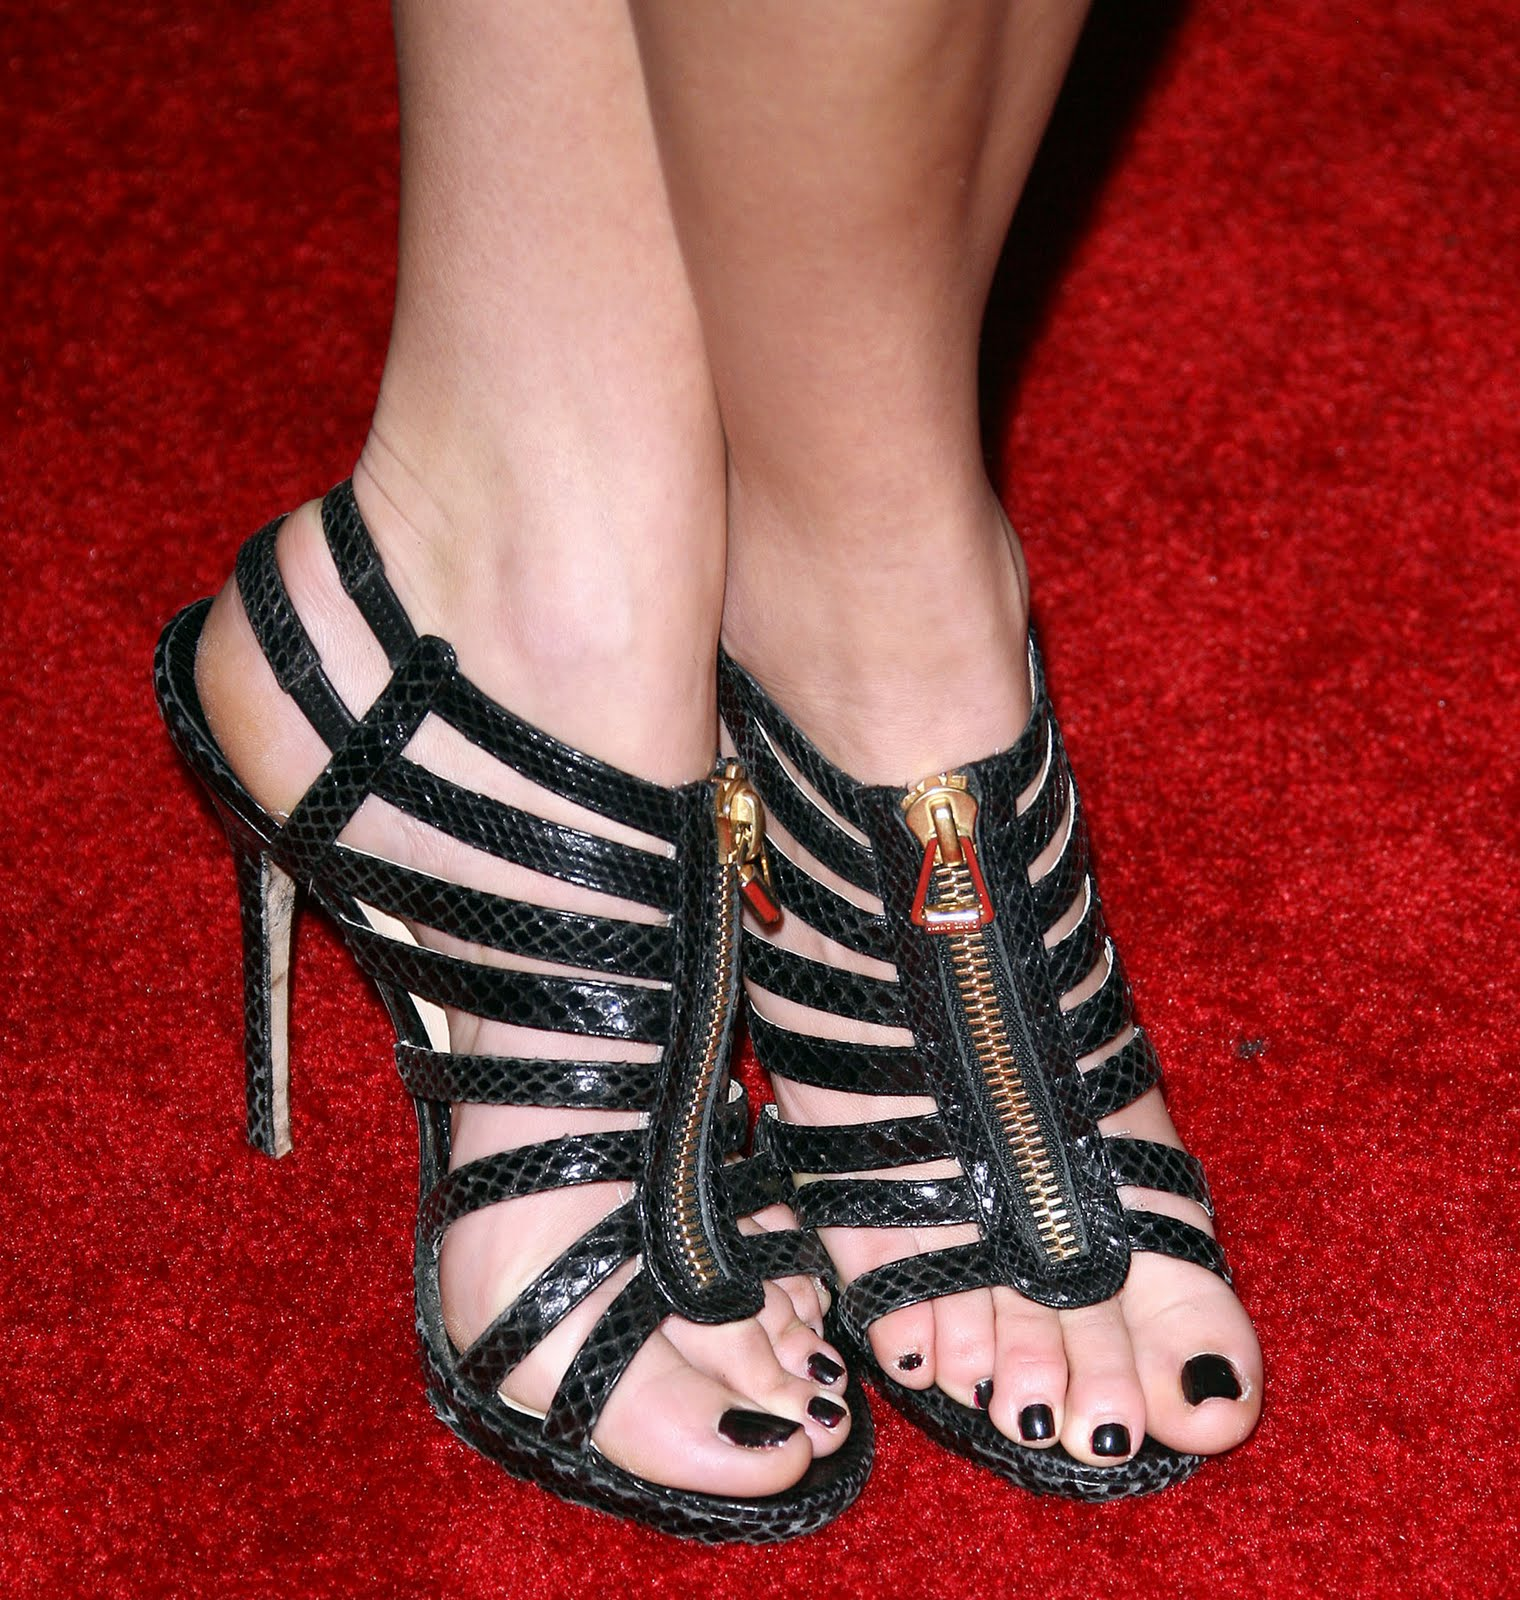 Feet Niki Taylor naked (63 photos), Tits, Paparazzi, Boobs, panties 2020